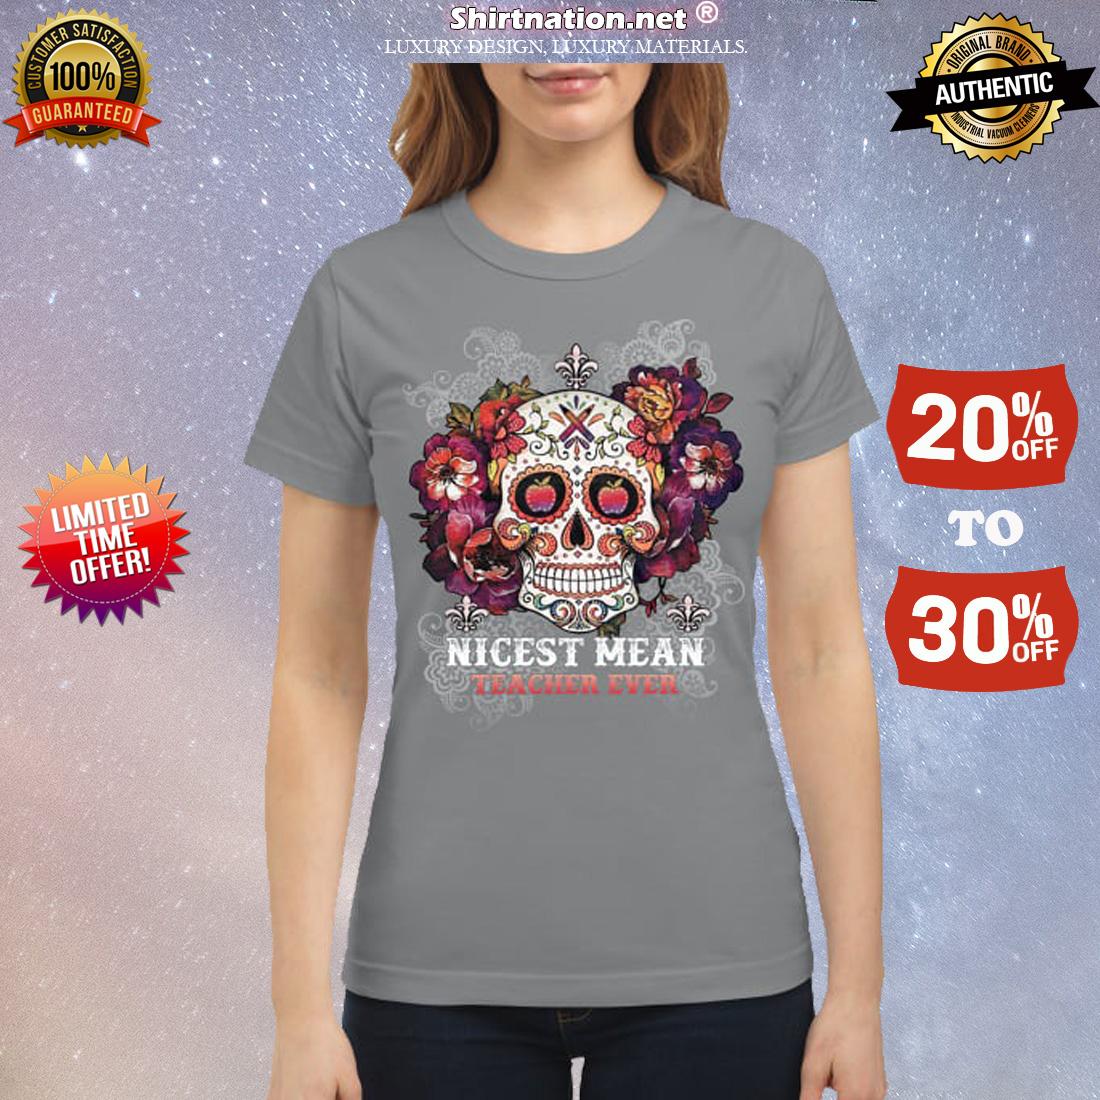 Skull nicest mean teacher ever classic shirt